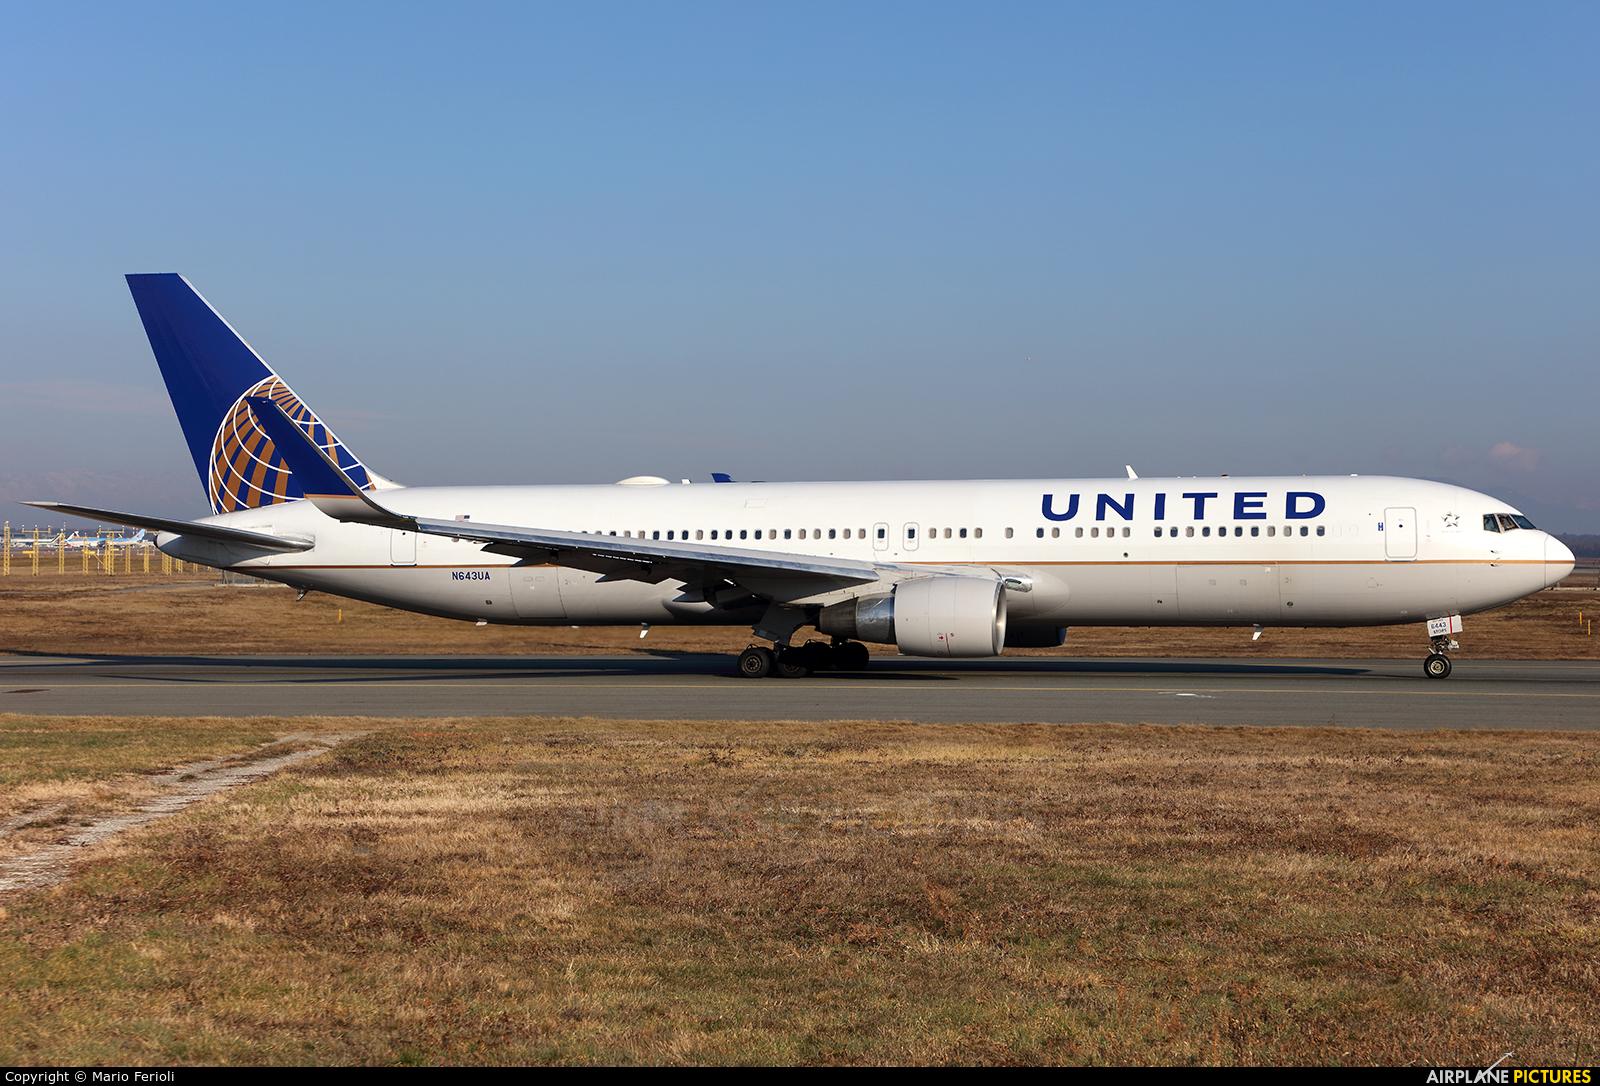 United Airlines N643UA aircraft at Milan - Malpensa